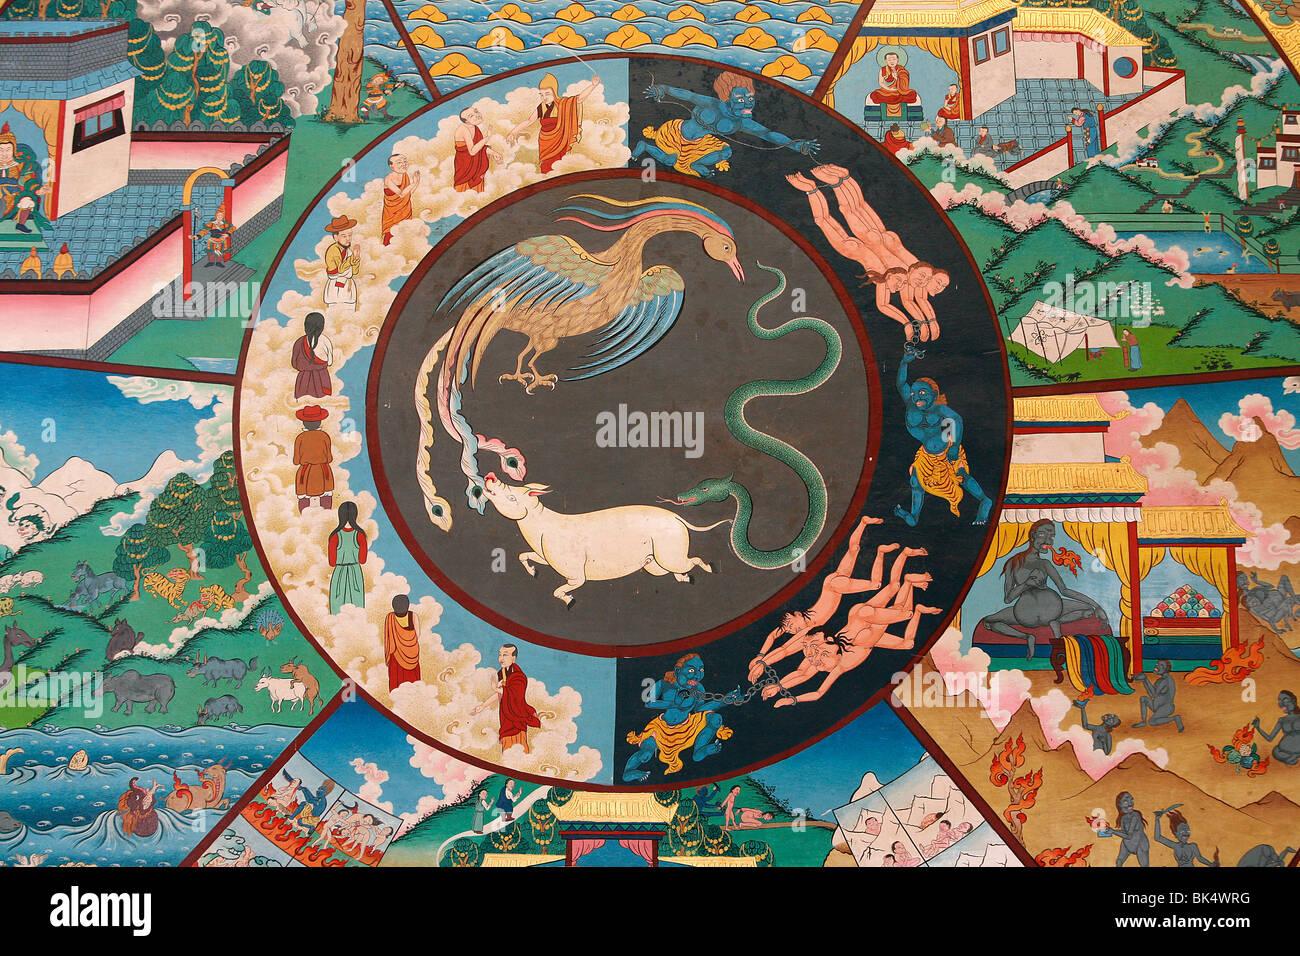 Wheel of life (wheel of Samsara) showing rooster, snake and pig, Kopan monastery, Kathmandu, Nepal, Asia - Stock Image